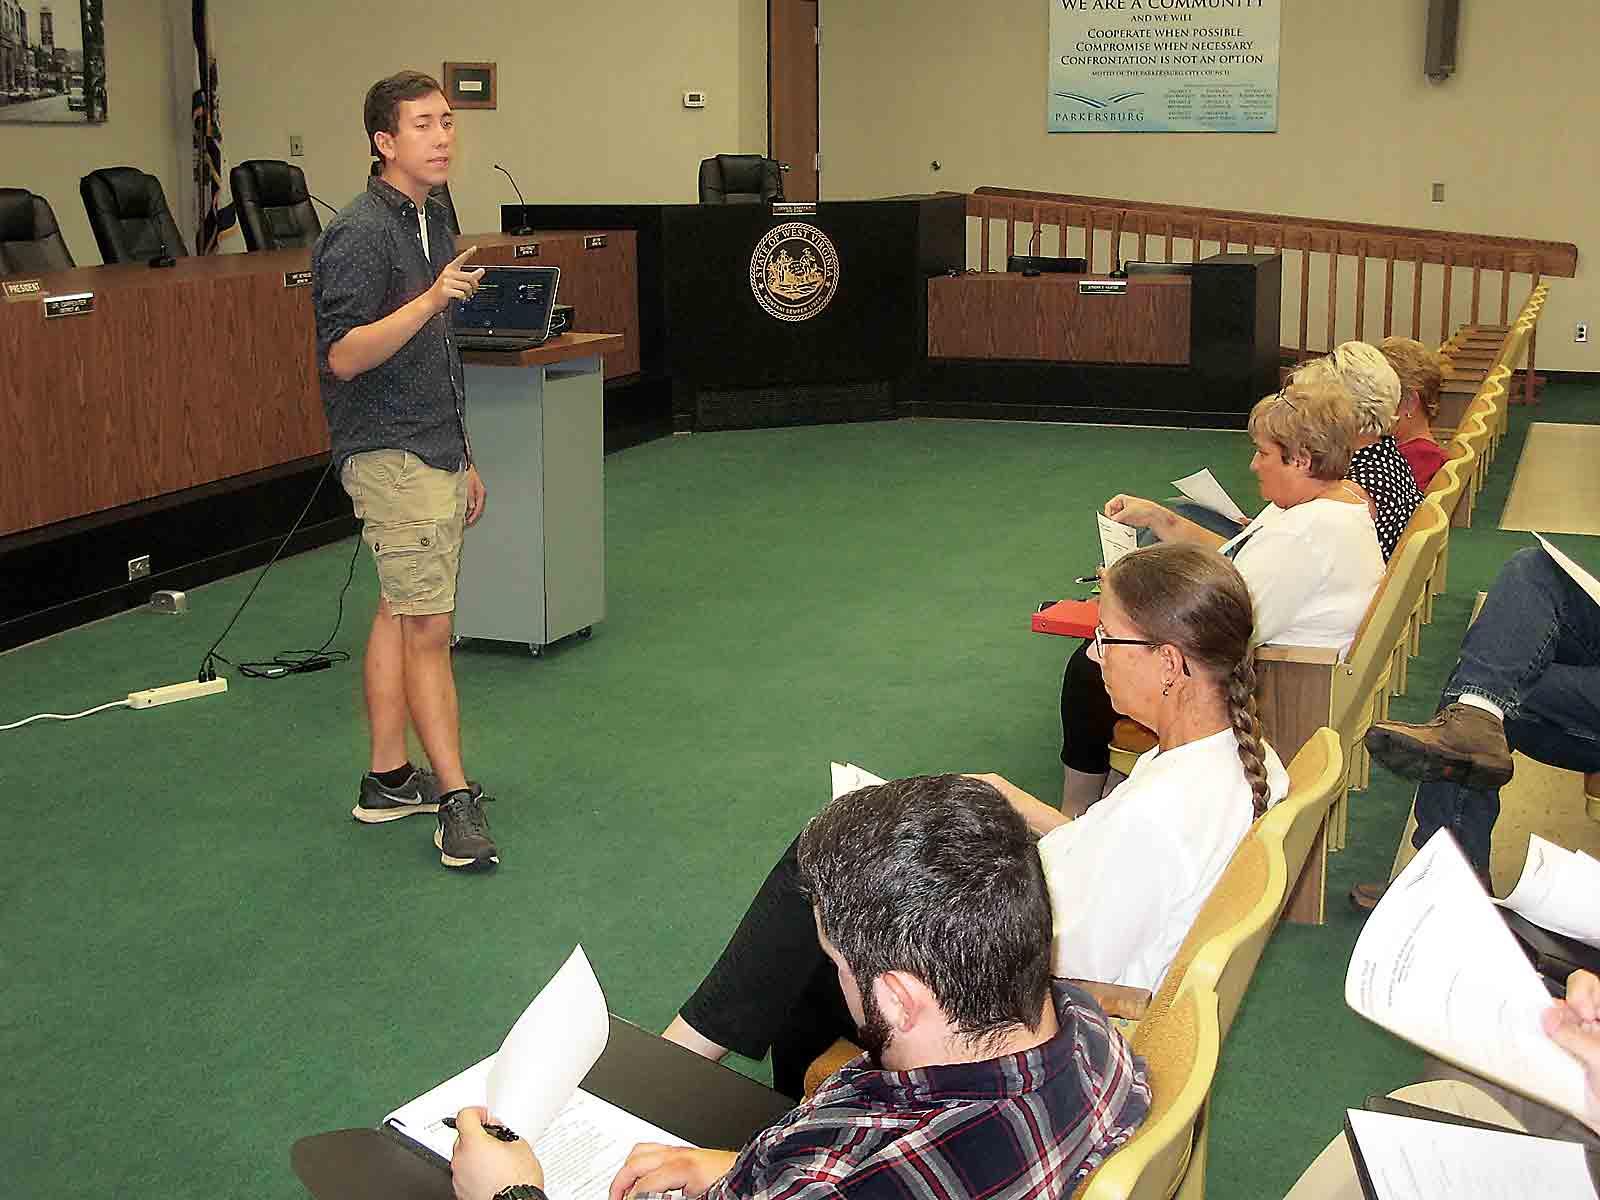 Court association arizona teen courts any